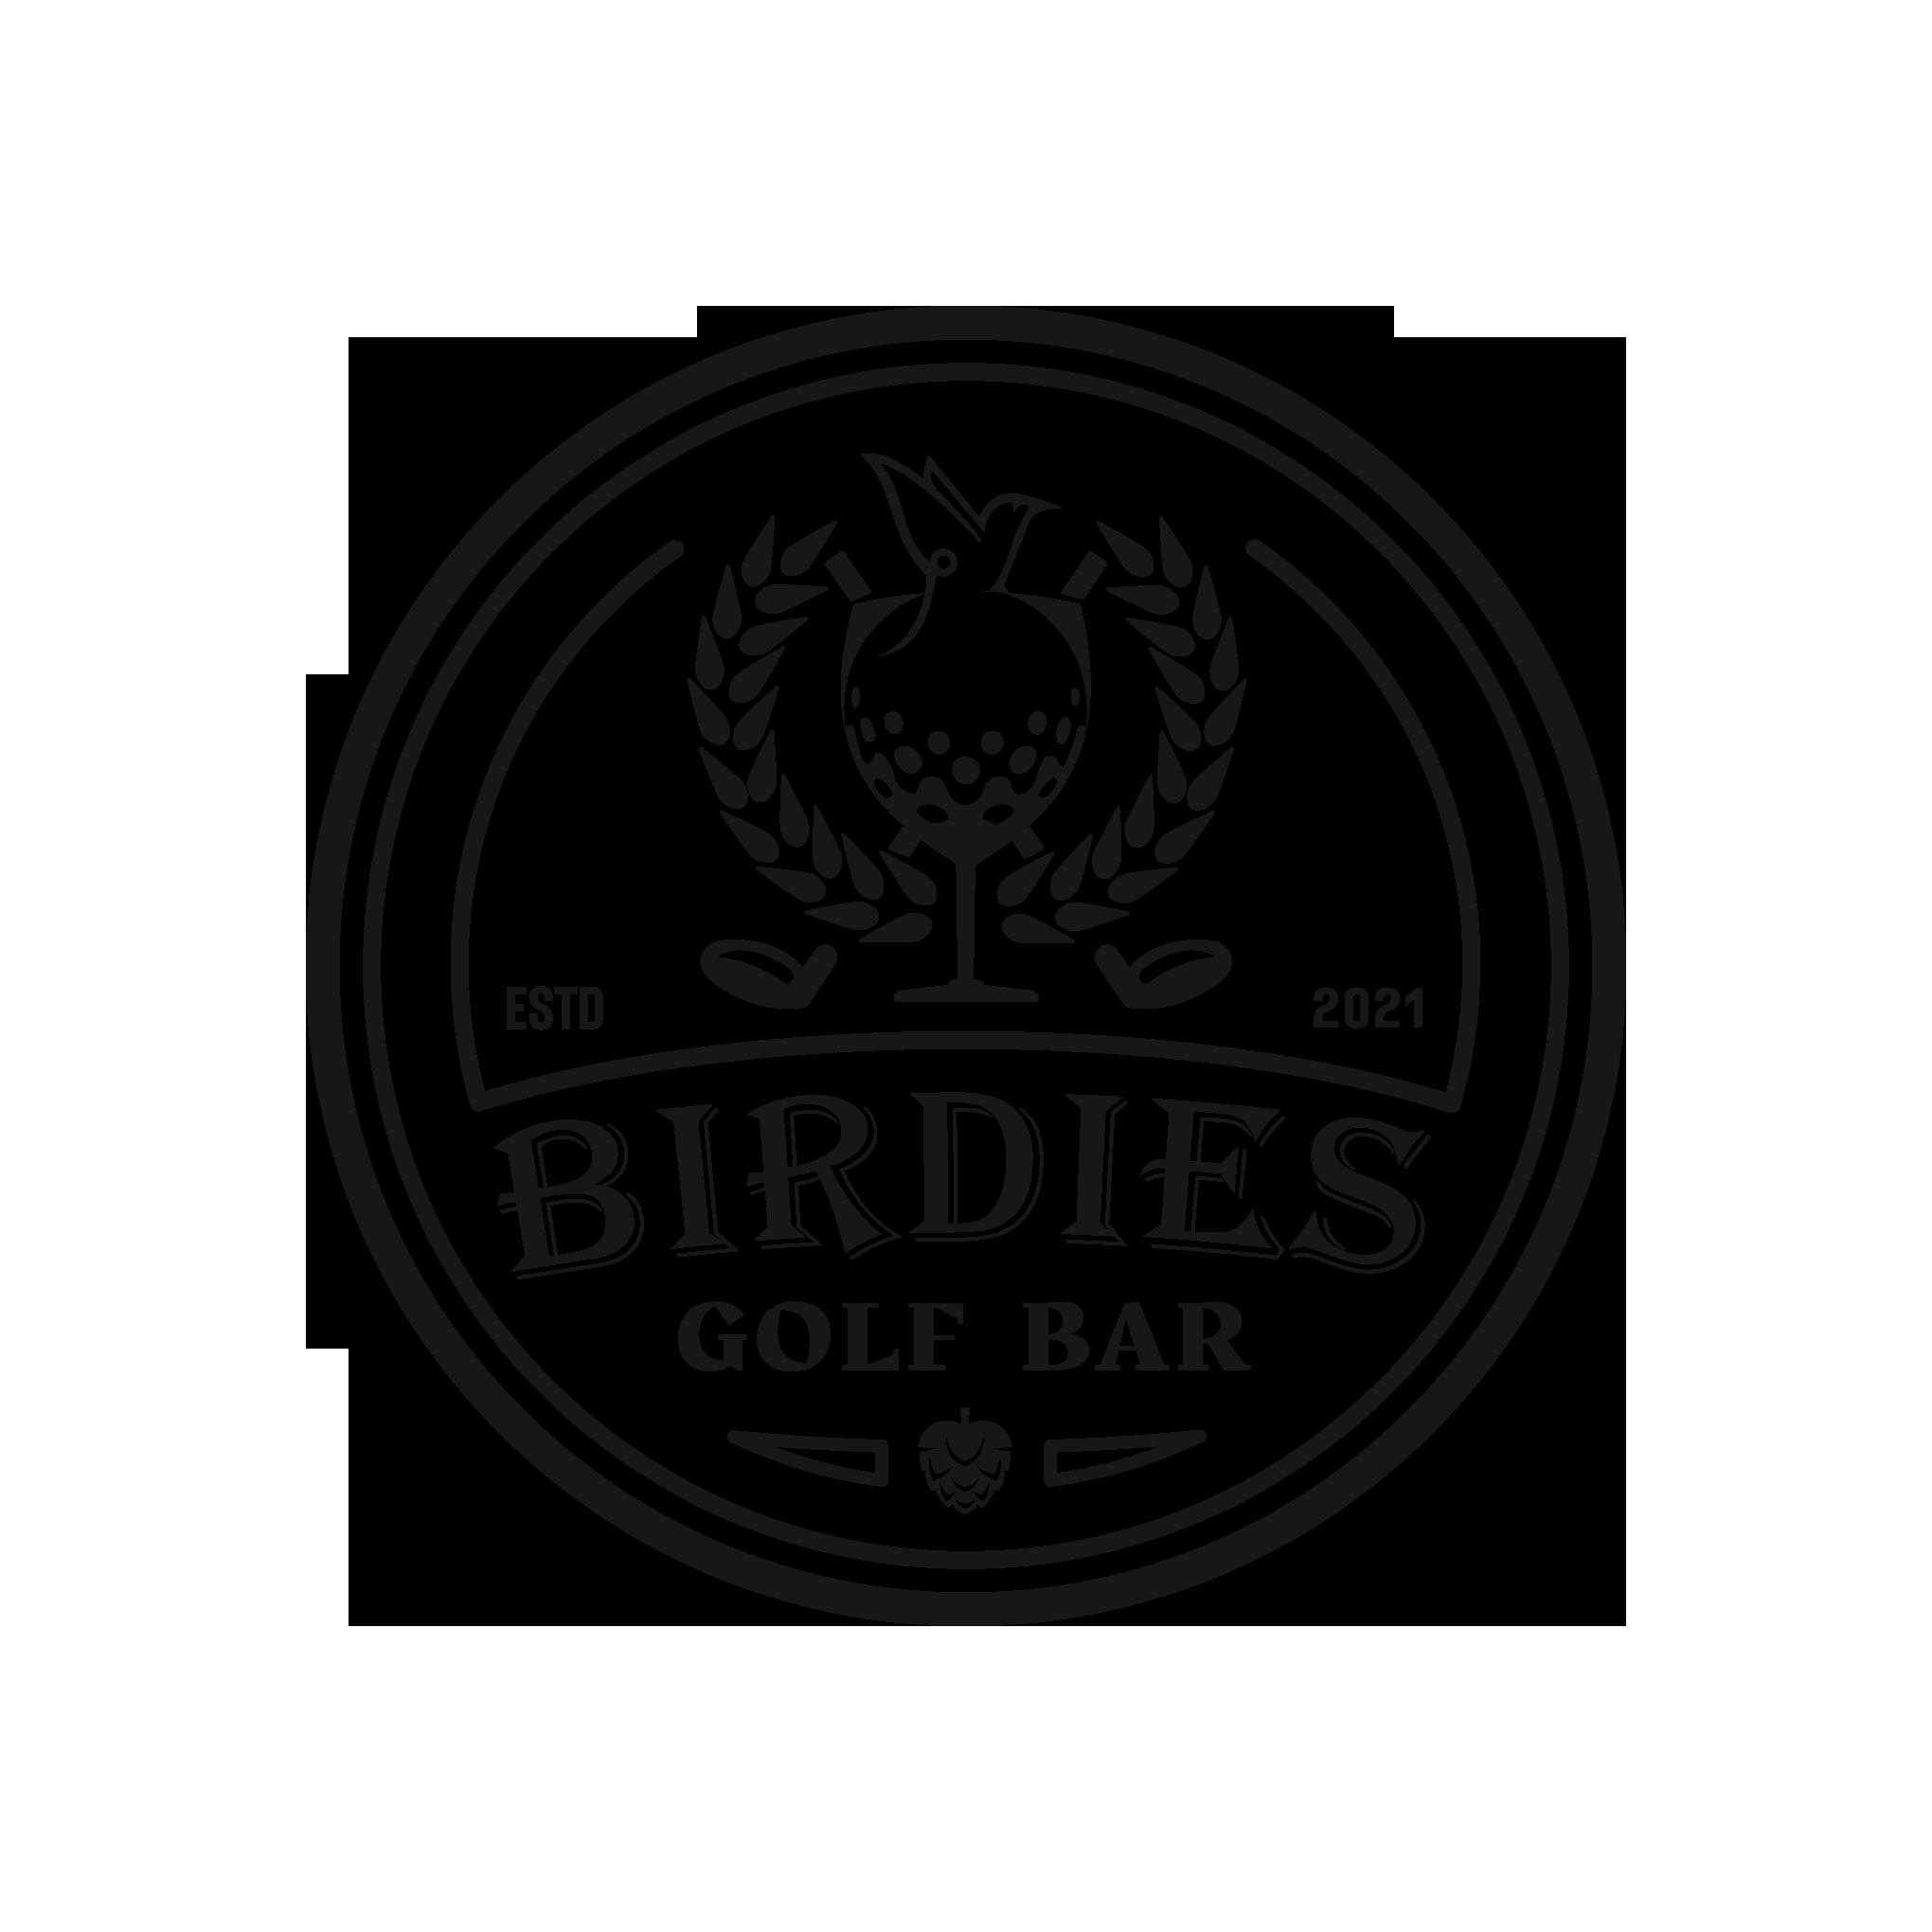 Birdies Golf Bar | Crested Butte